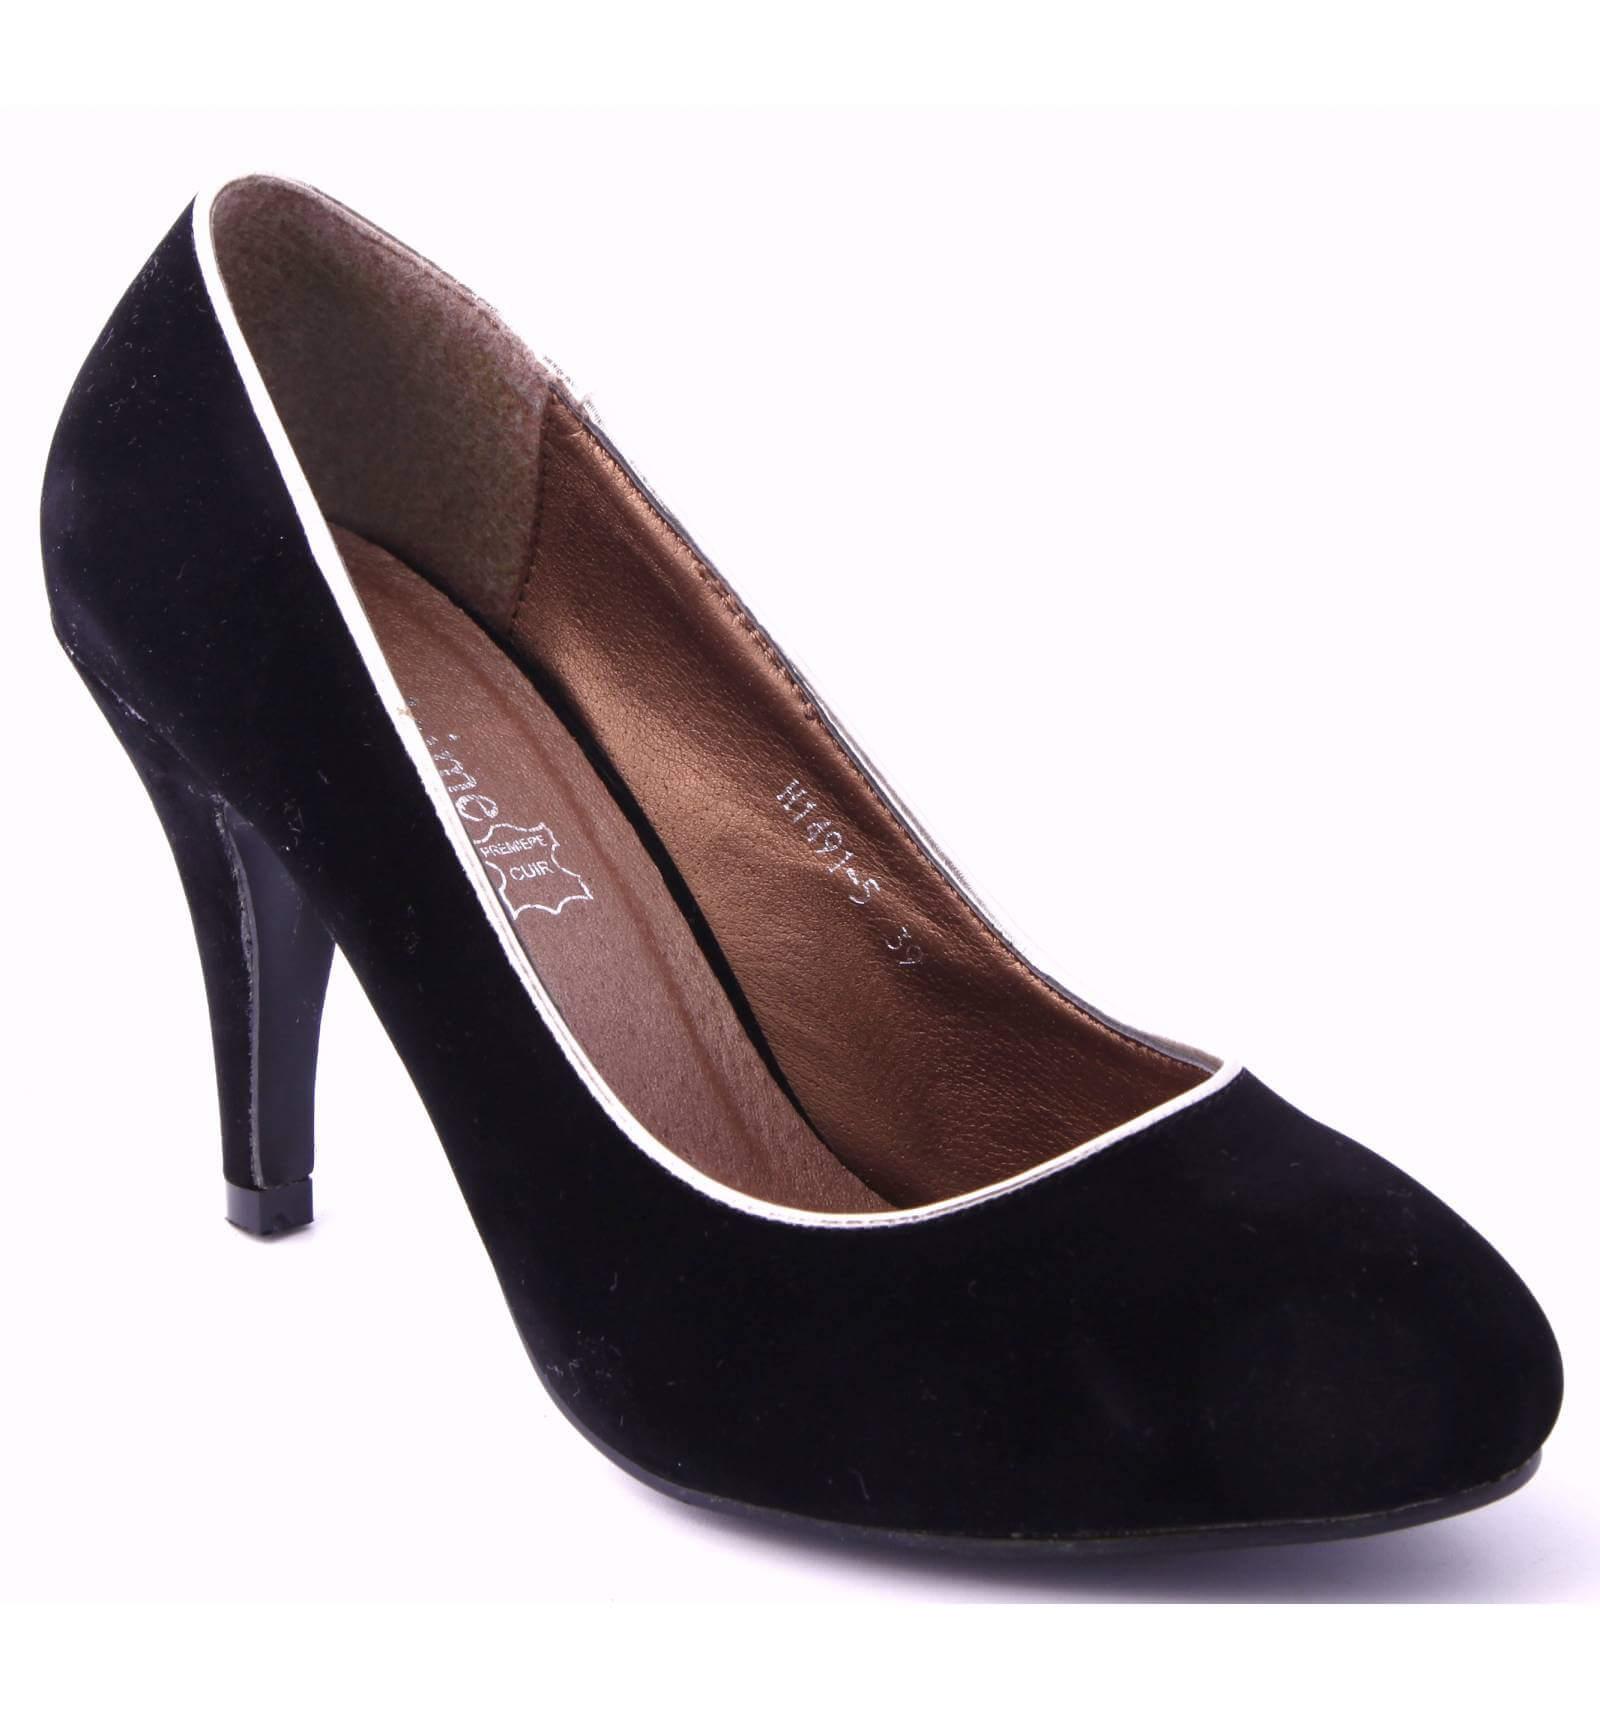 escarpin talon aspect su dine noir lana paris city shoes. Black Bedroom Furniture Sets. Home Design Ideas